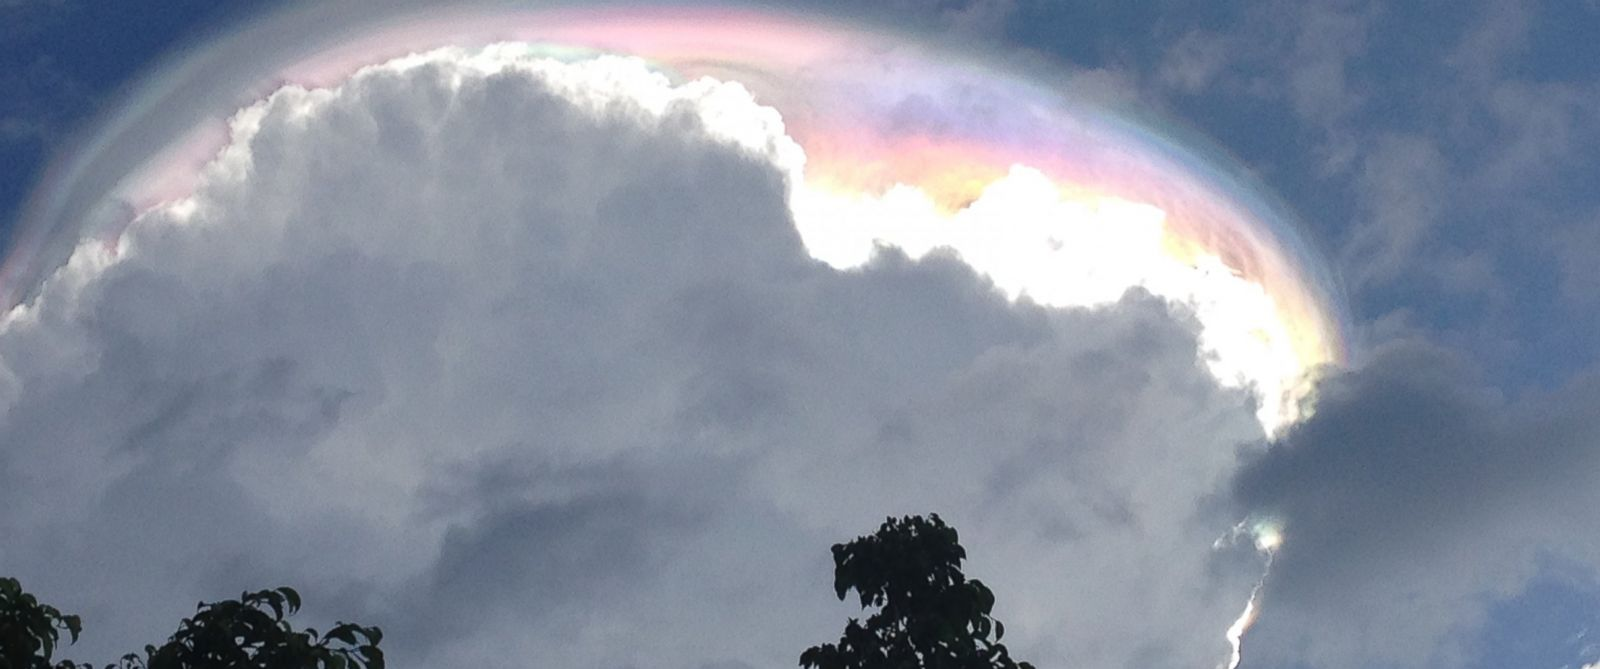 PHOTO: Ariel Joseph Petit, 11, spotted the iridescent cloud phenomenon pictured here on Sept. 15, 2015, in Escazu, Costa Rica.